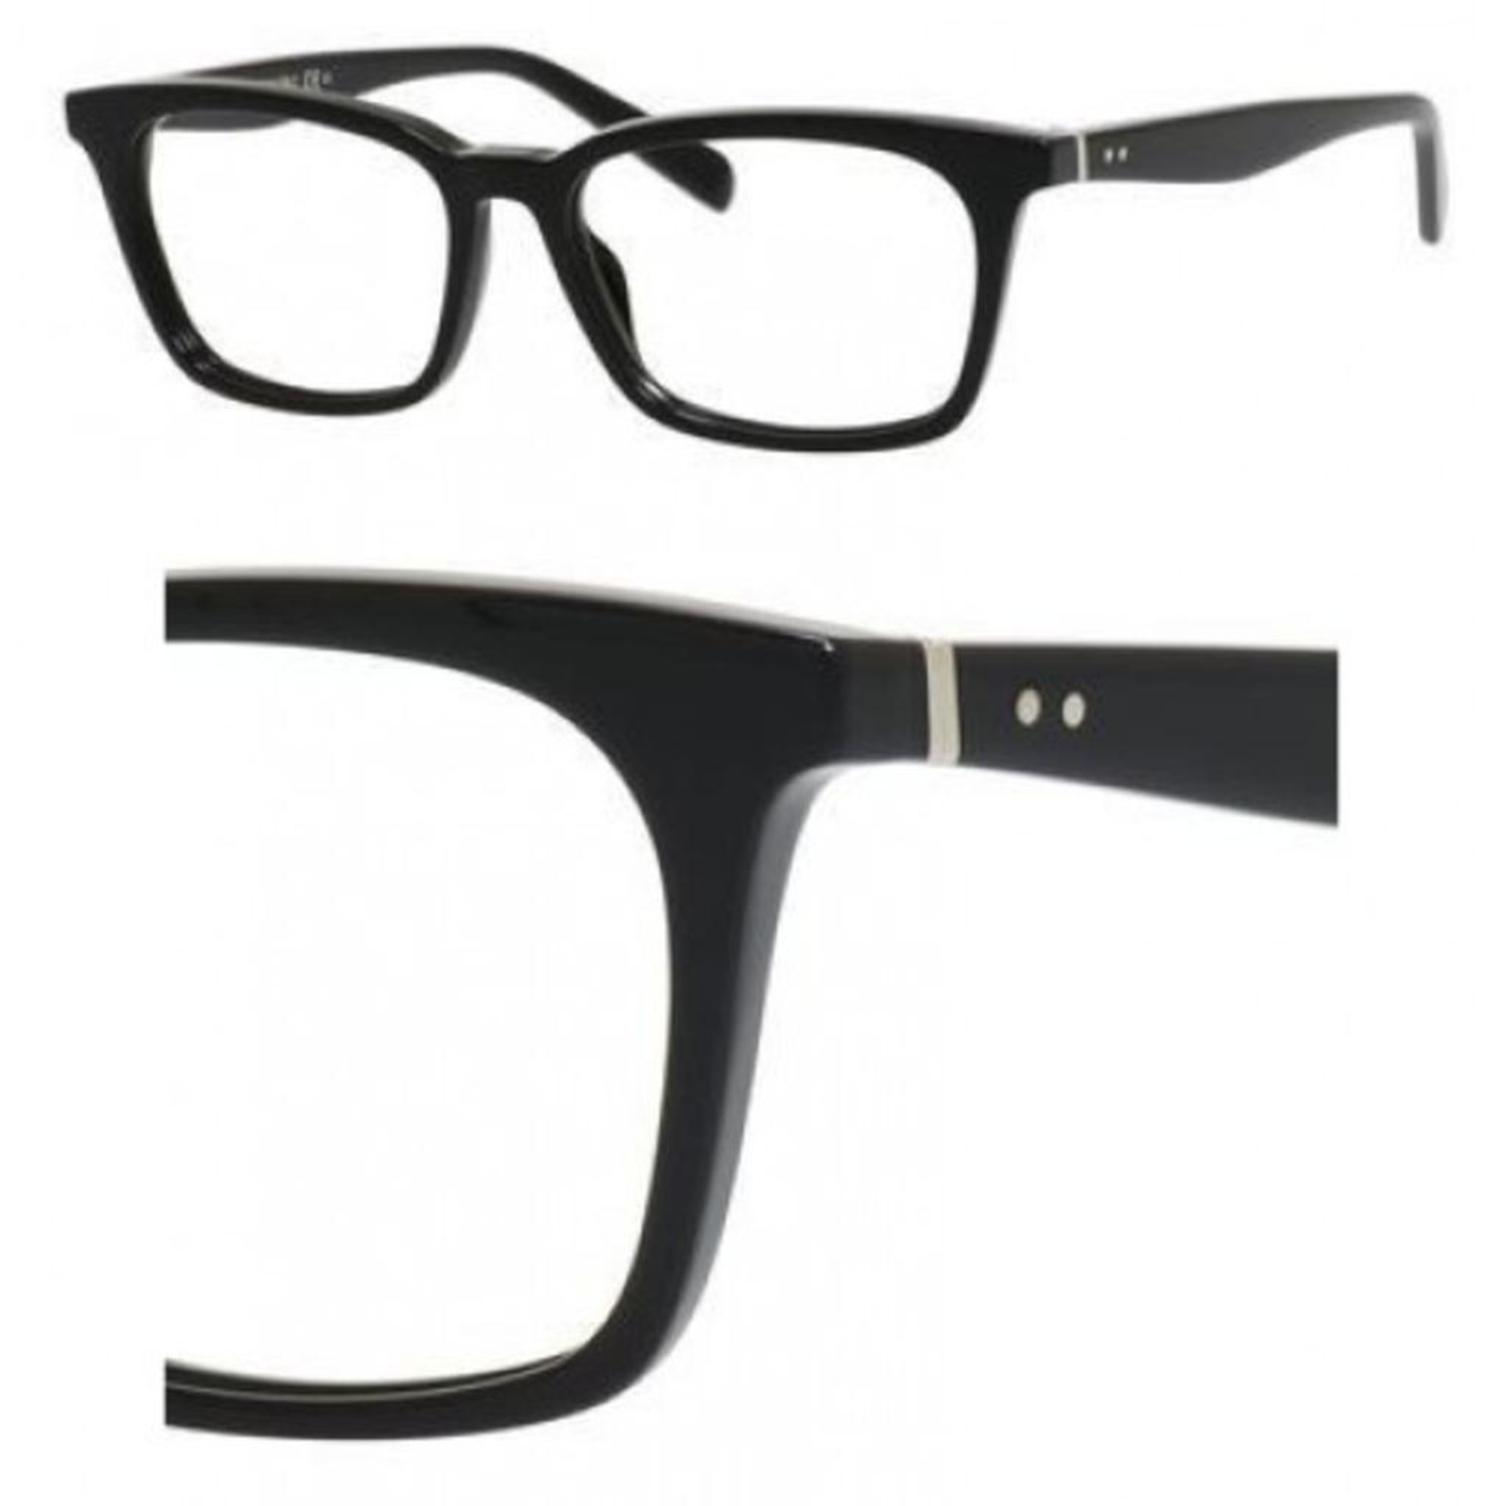 2505f0d52b17 Eyeglasses Celine 41345 0807 Black - Walmart.com